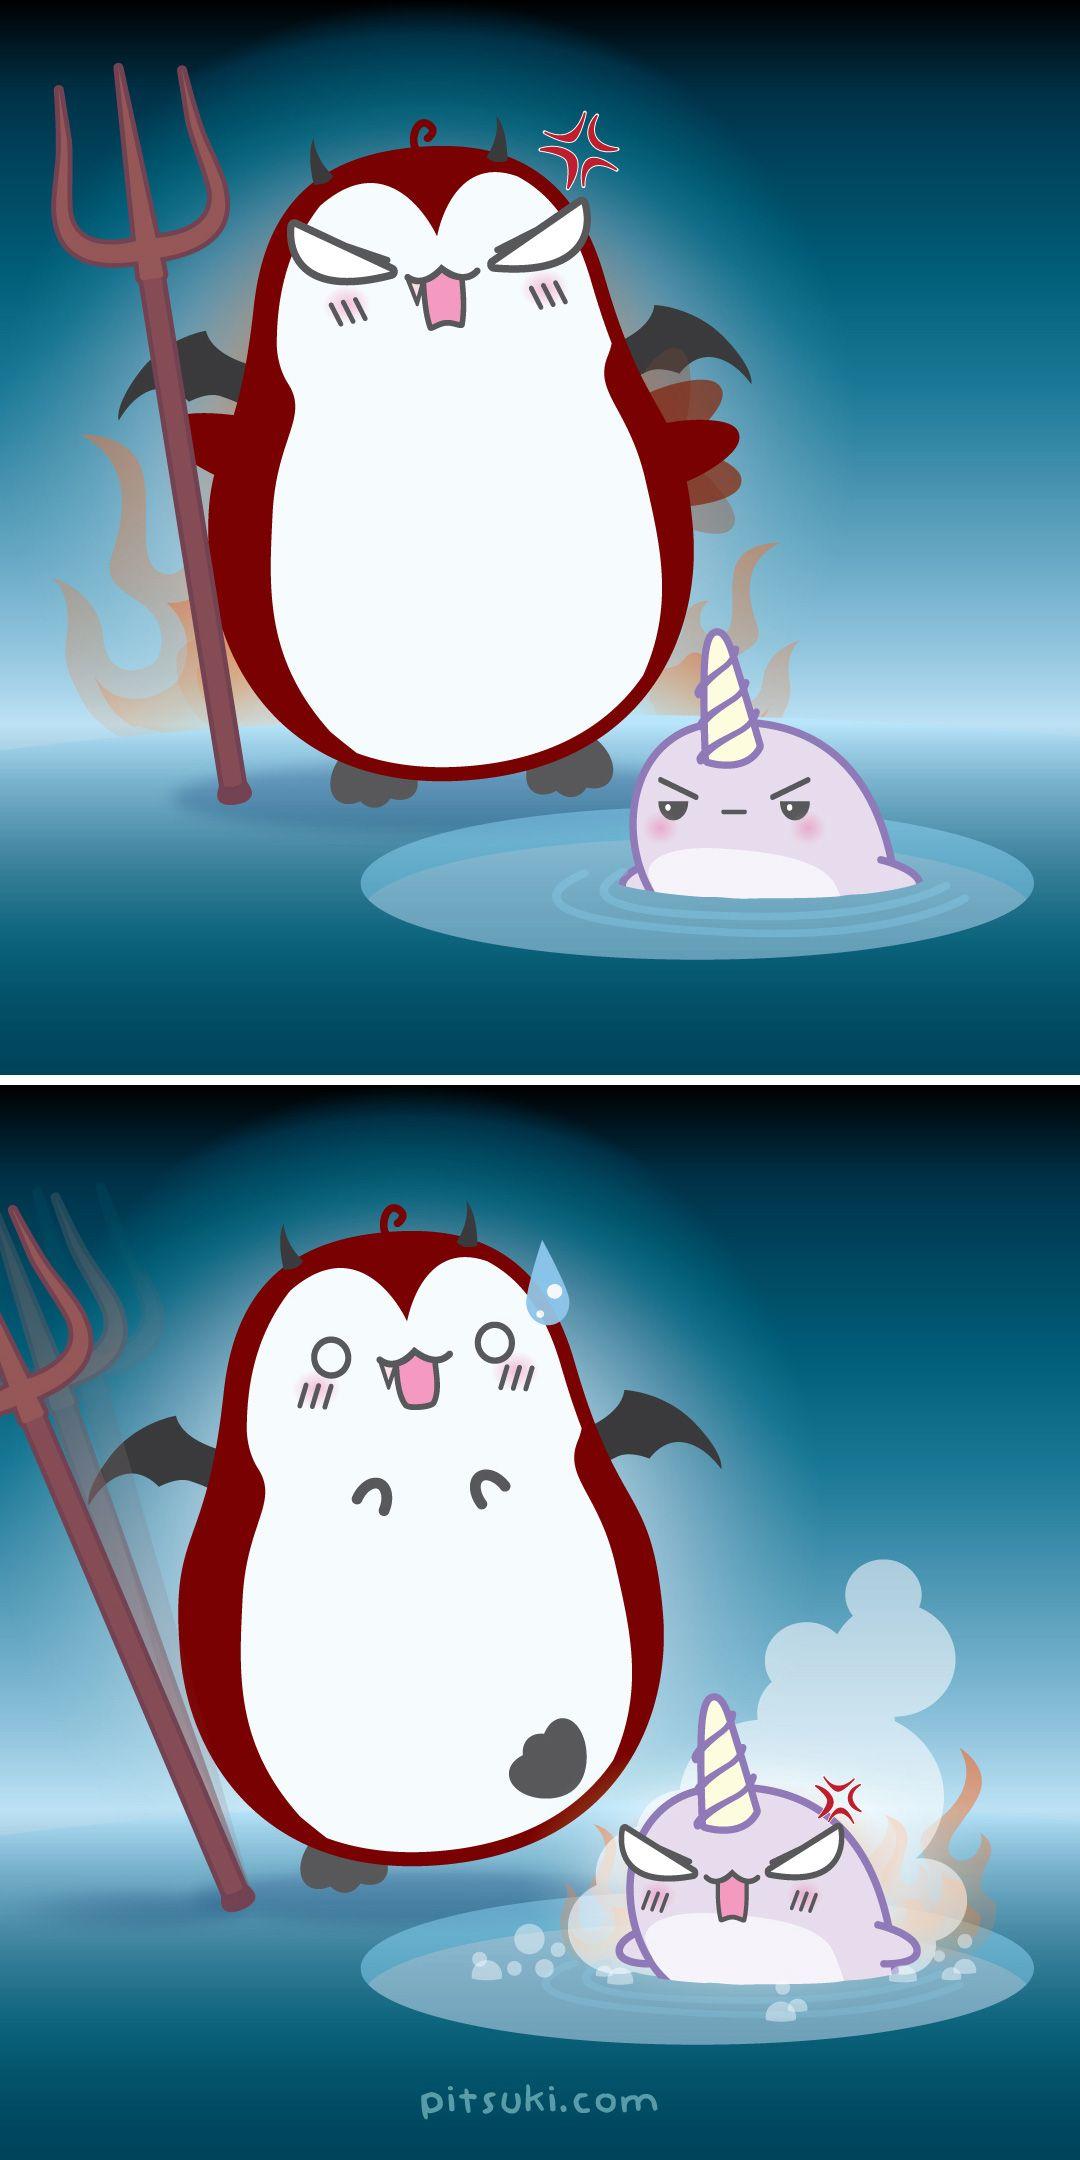 Wrath Of Mome >> Penguin Narwhal Kawaii Cute Illustrator Pitsuki 7deadlysins